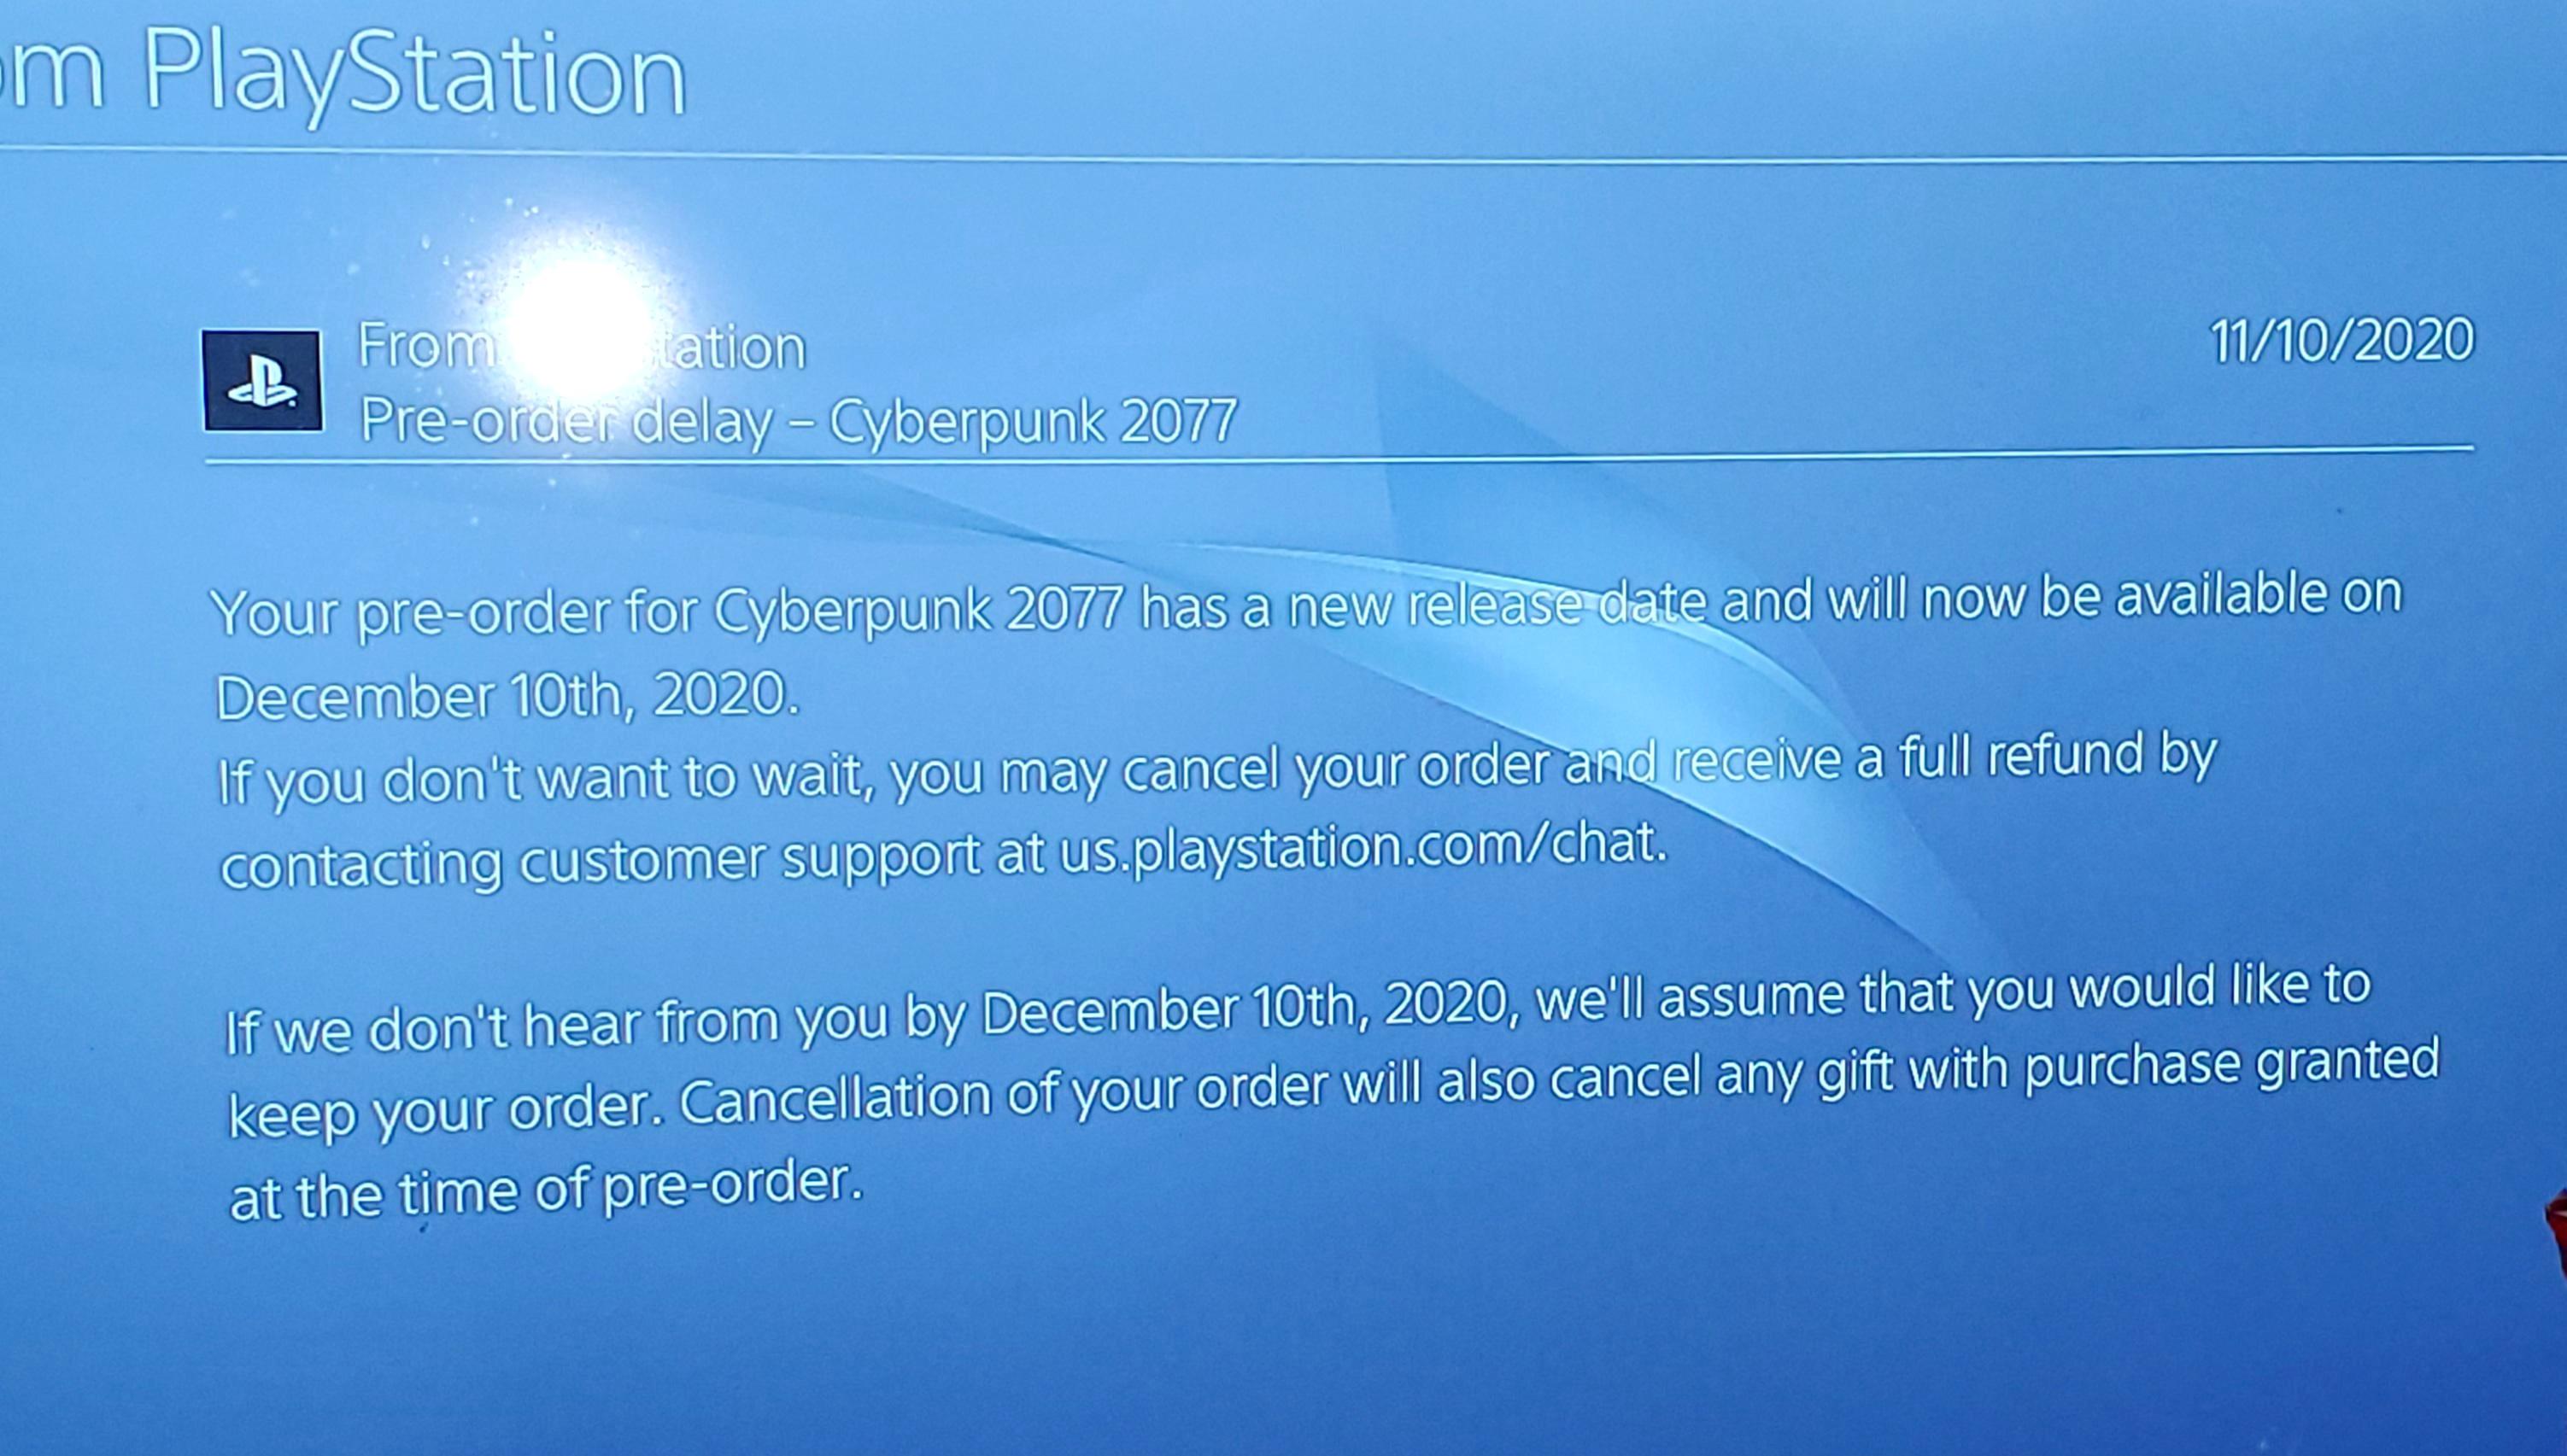 Sony предложила отменить предзаказ Cyberpunk 2077